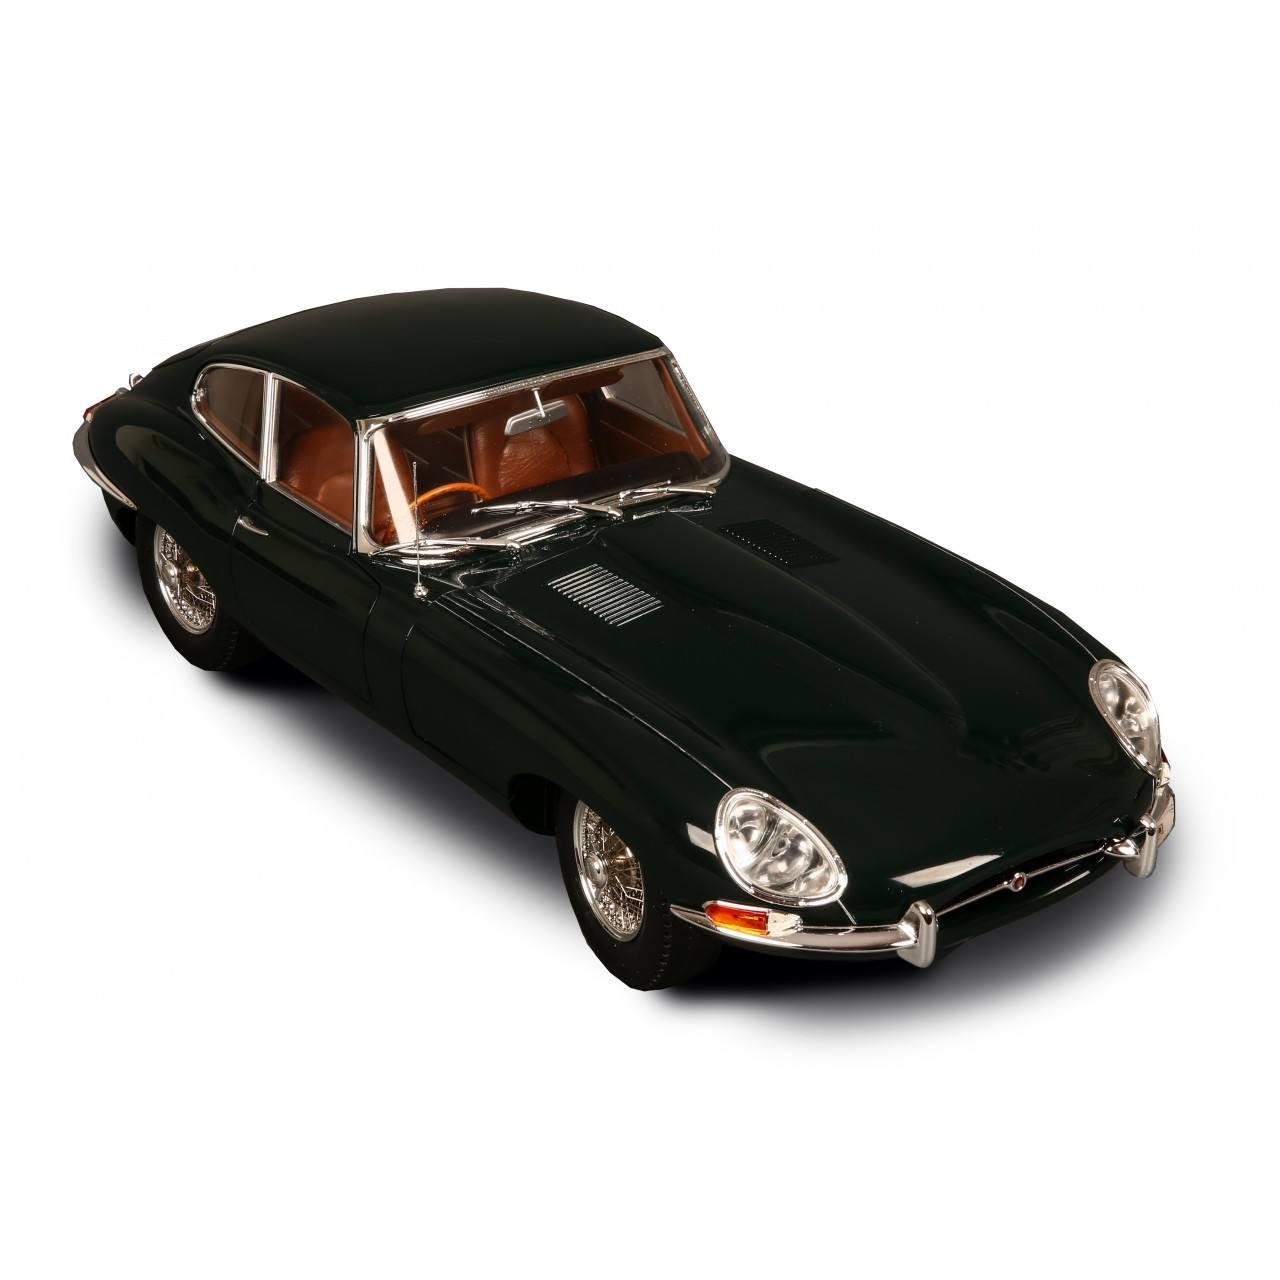 Jaguar jaguar e : Build the Jaguar E-Type | ModelSpace